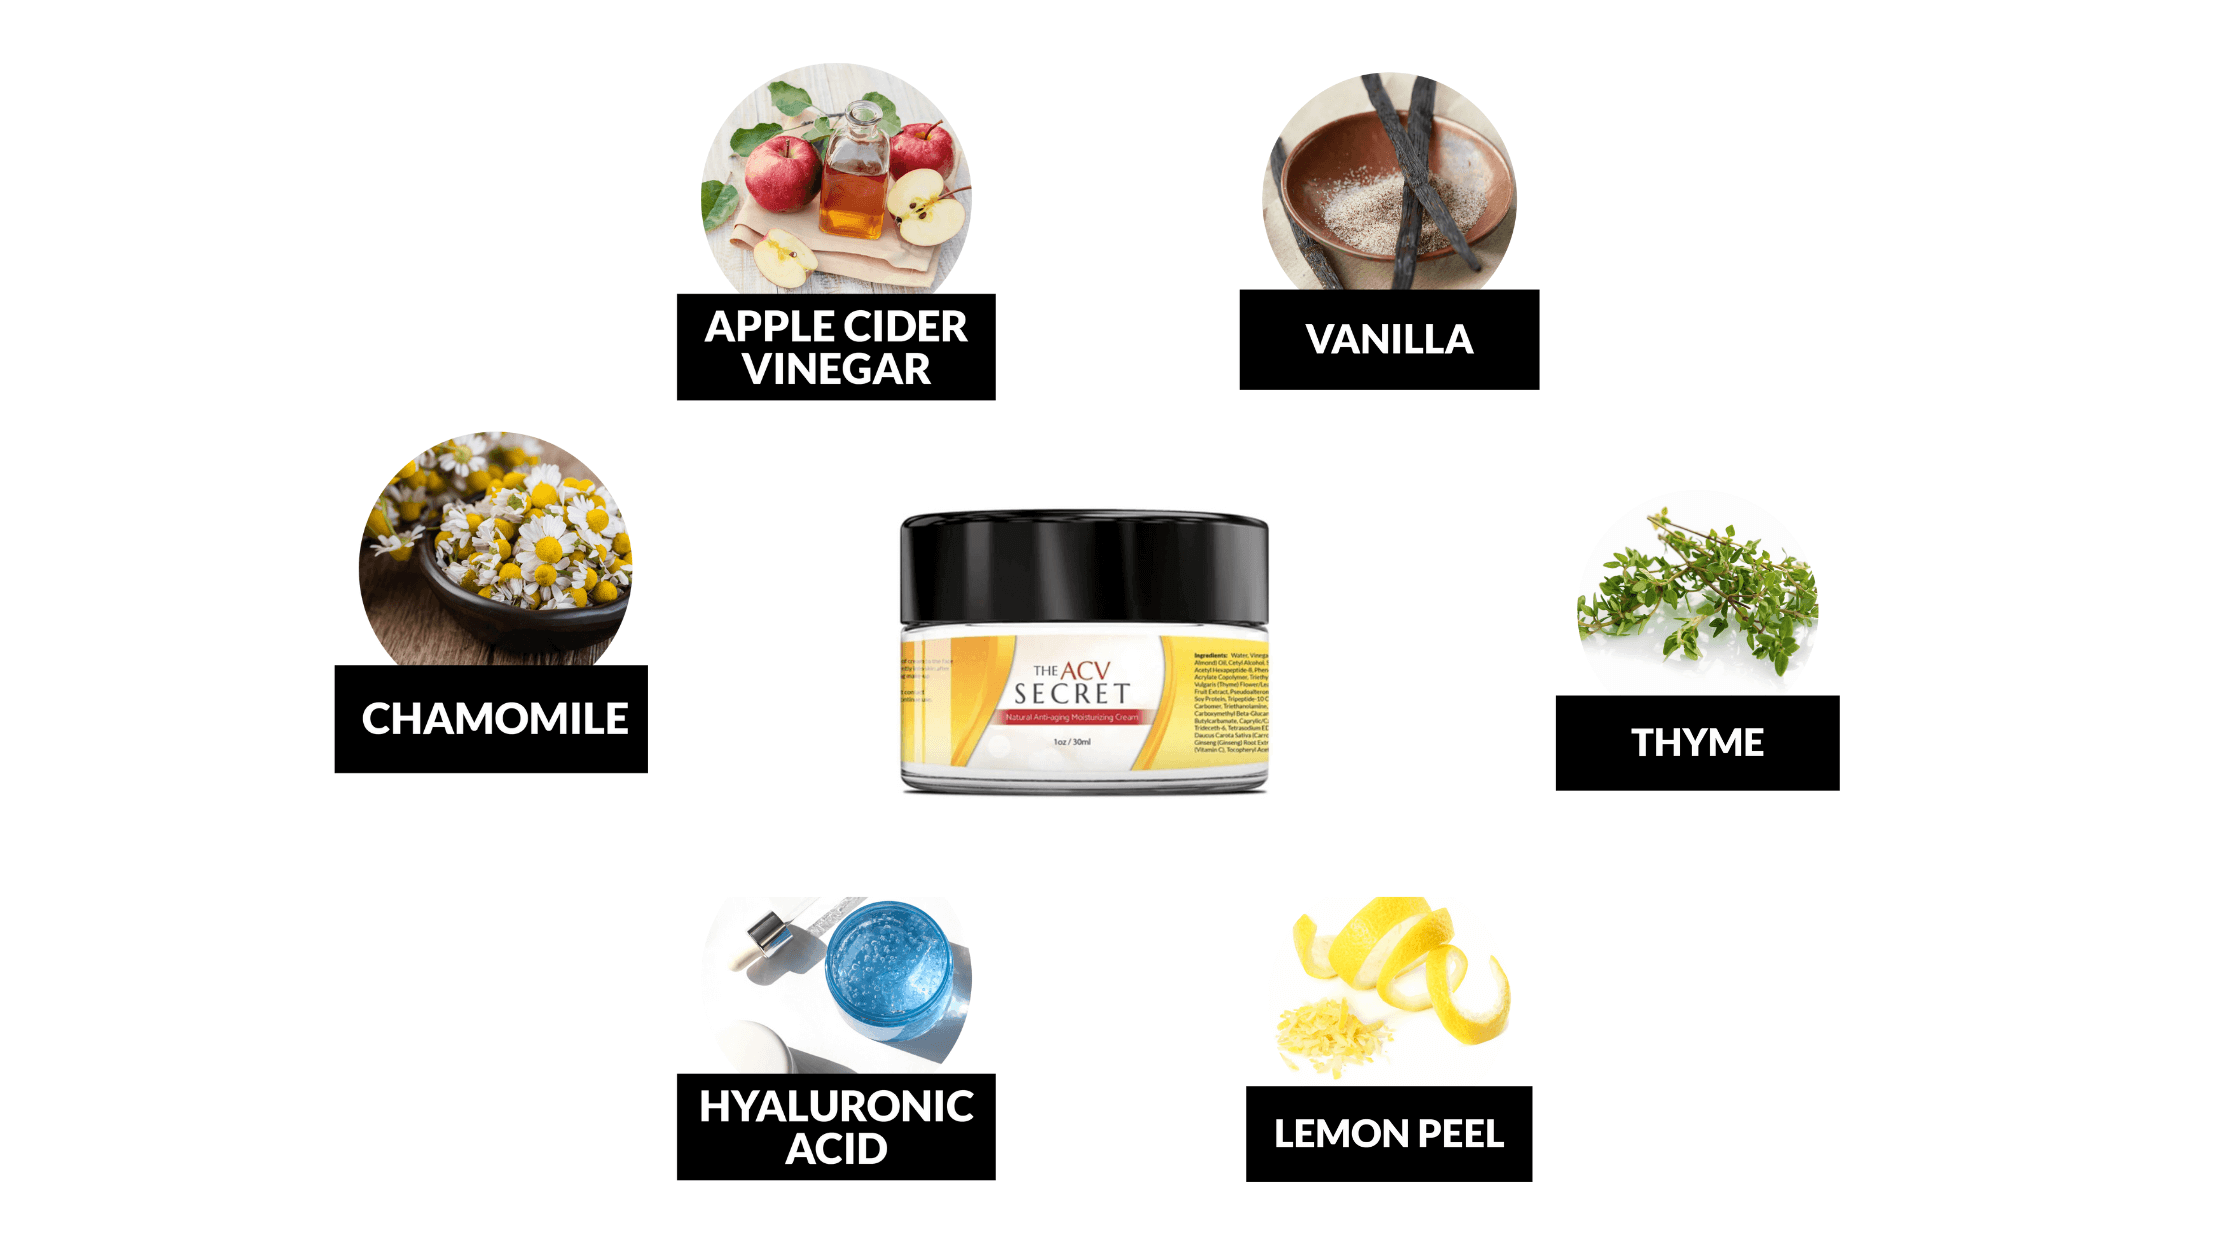 The ACV Secret Ingredients